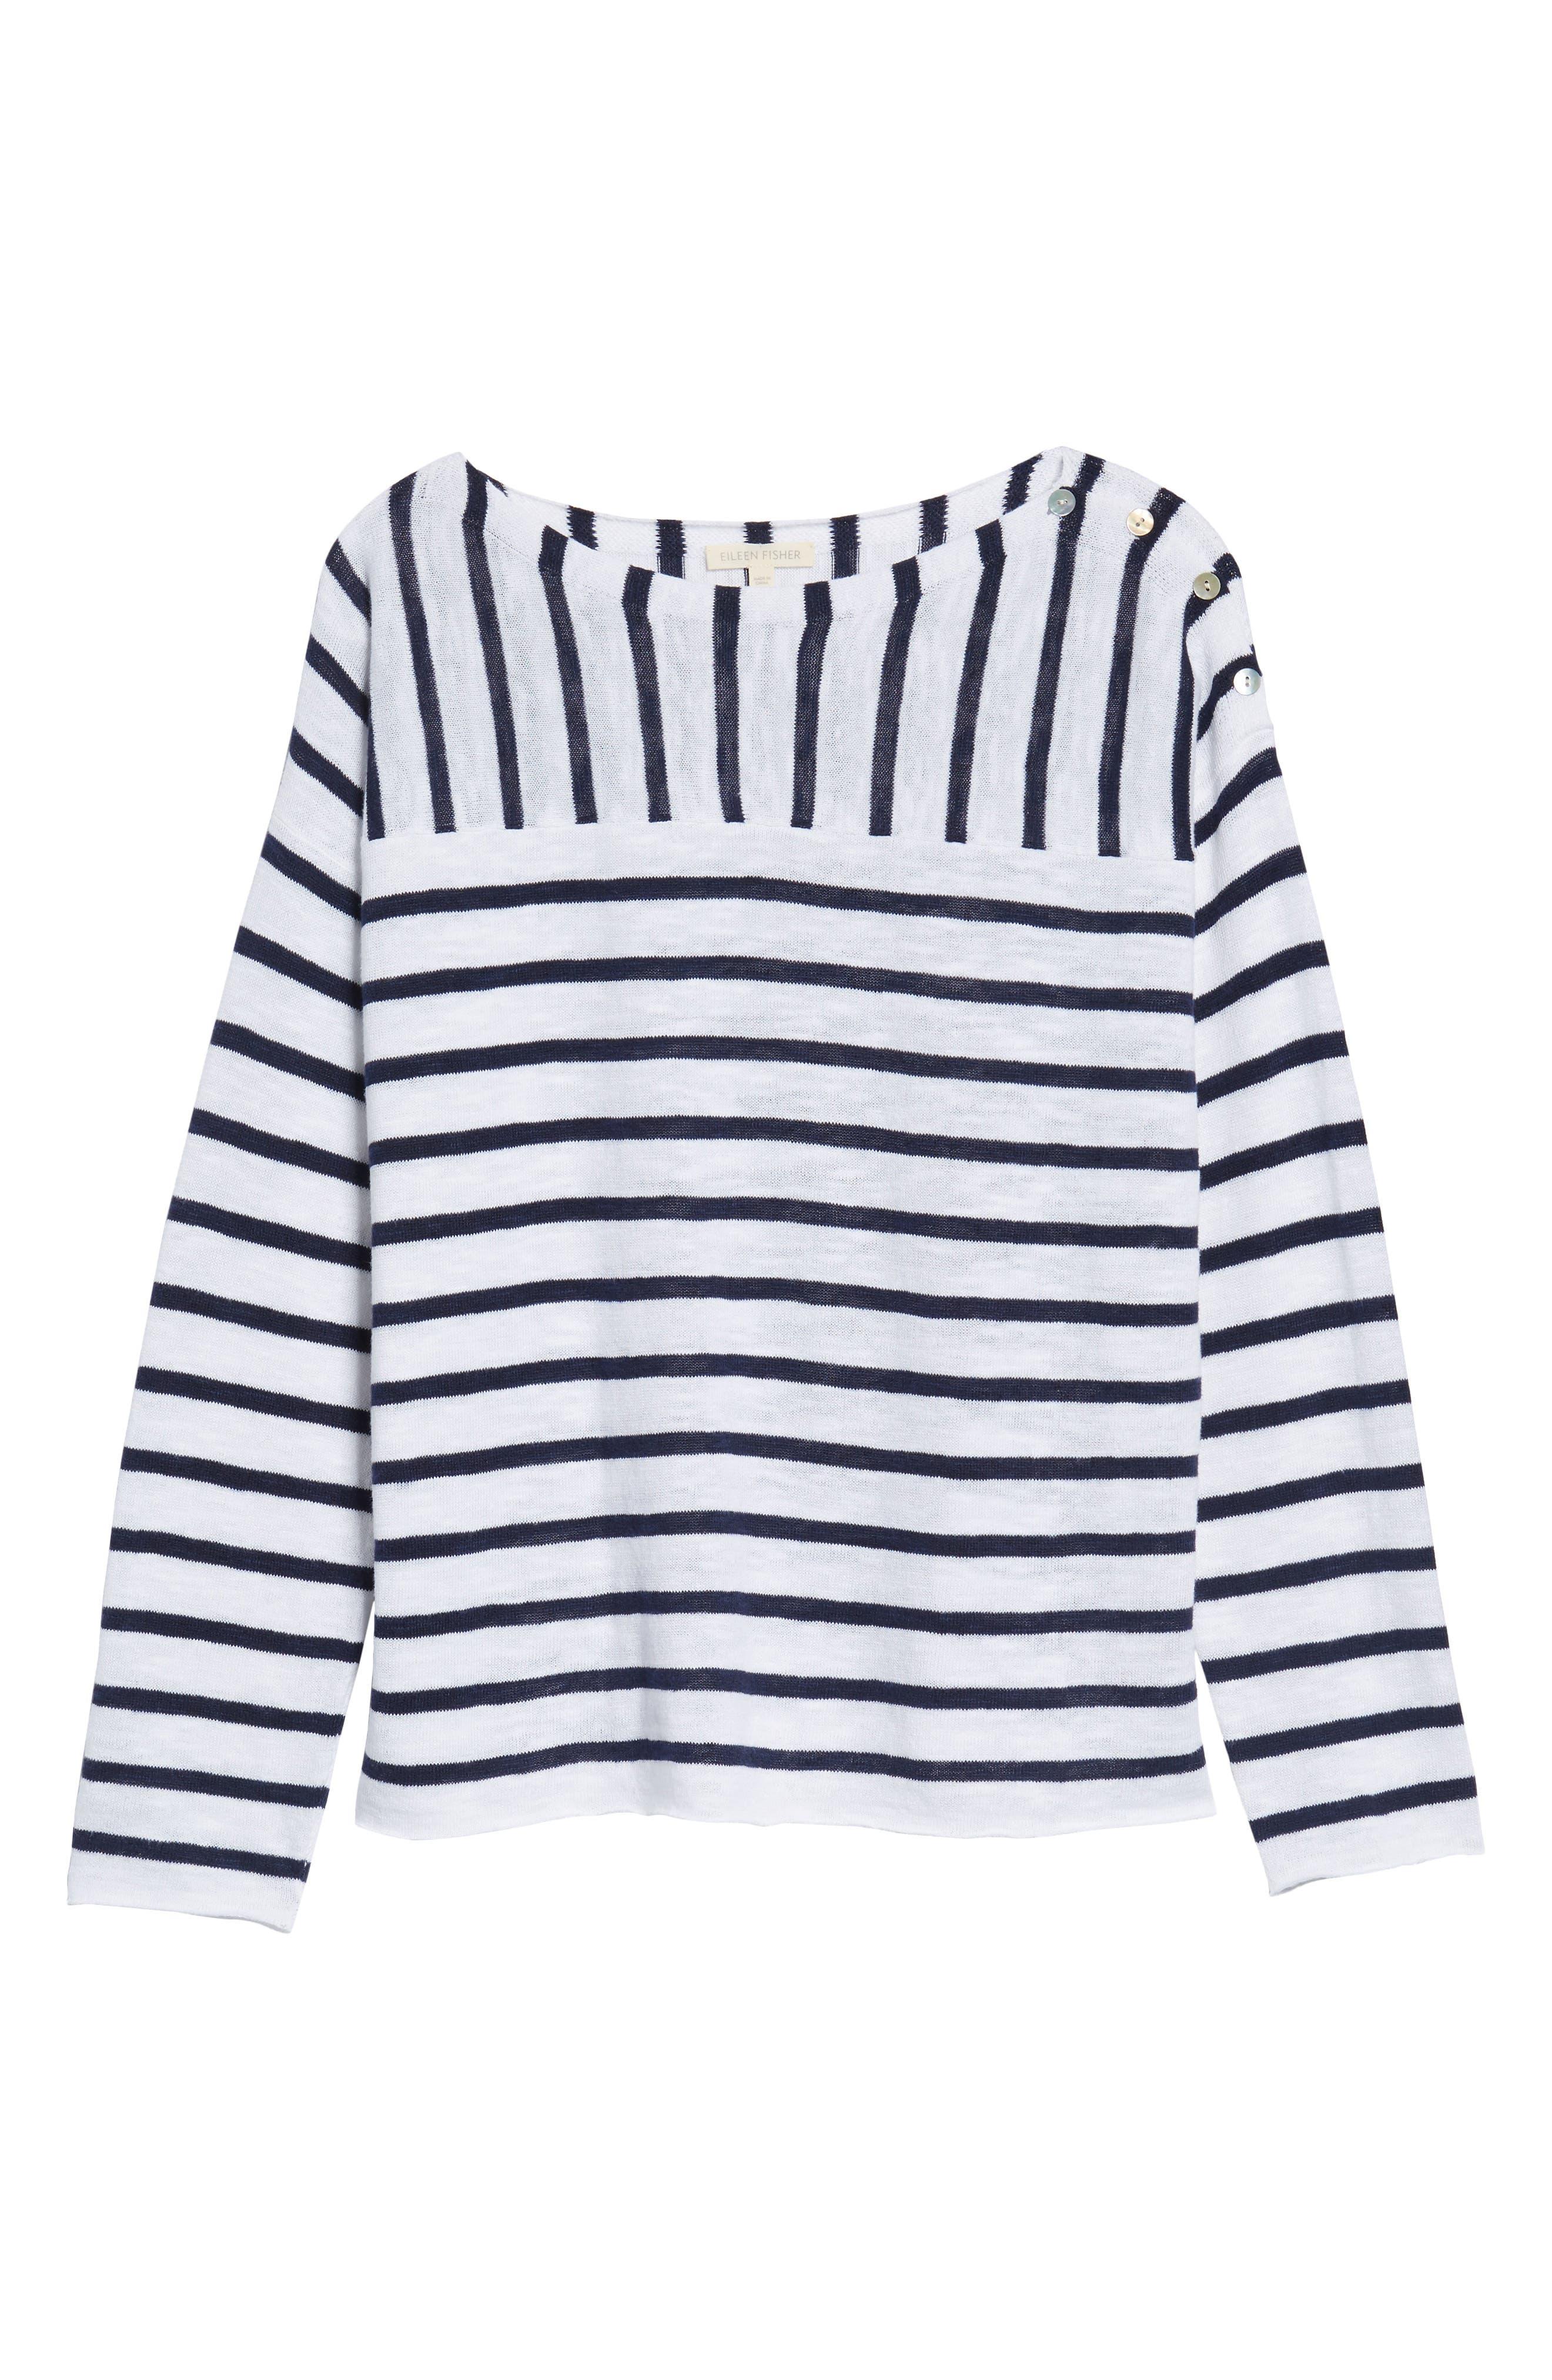 Stripe Organic Linen & Cotton Sweater,                             Alternate thumbnail 6, color,                             143